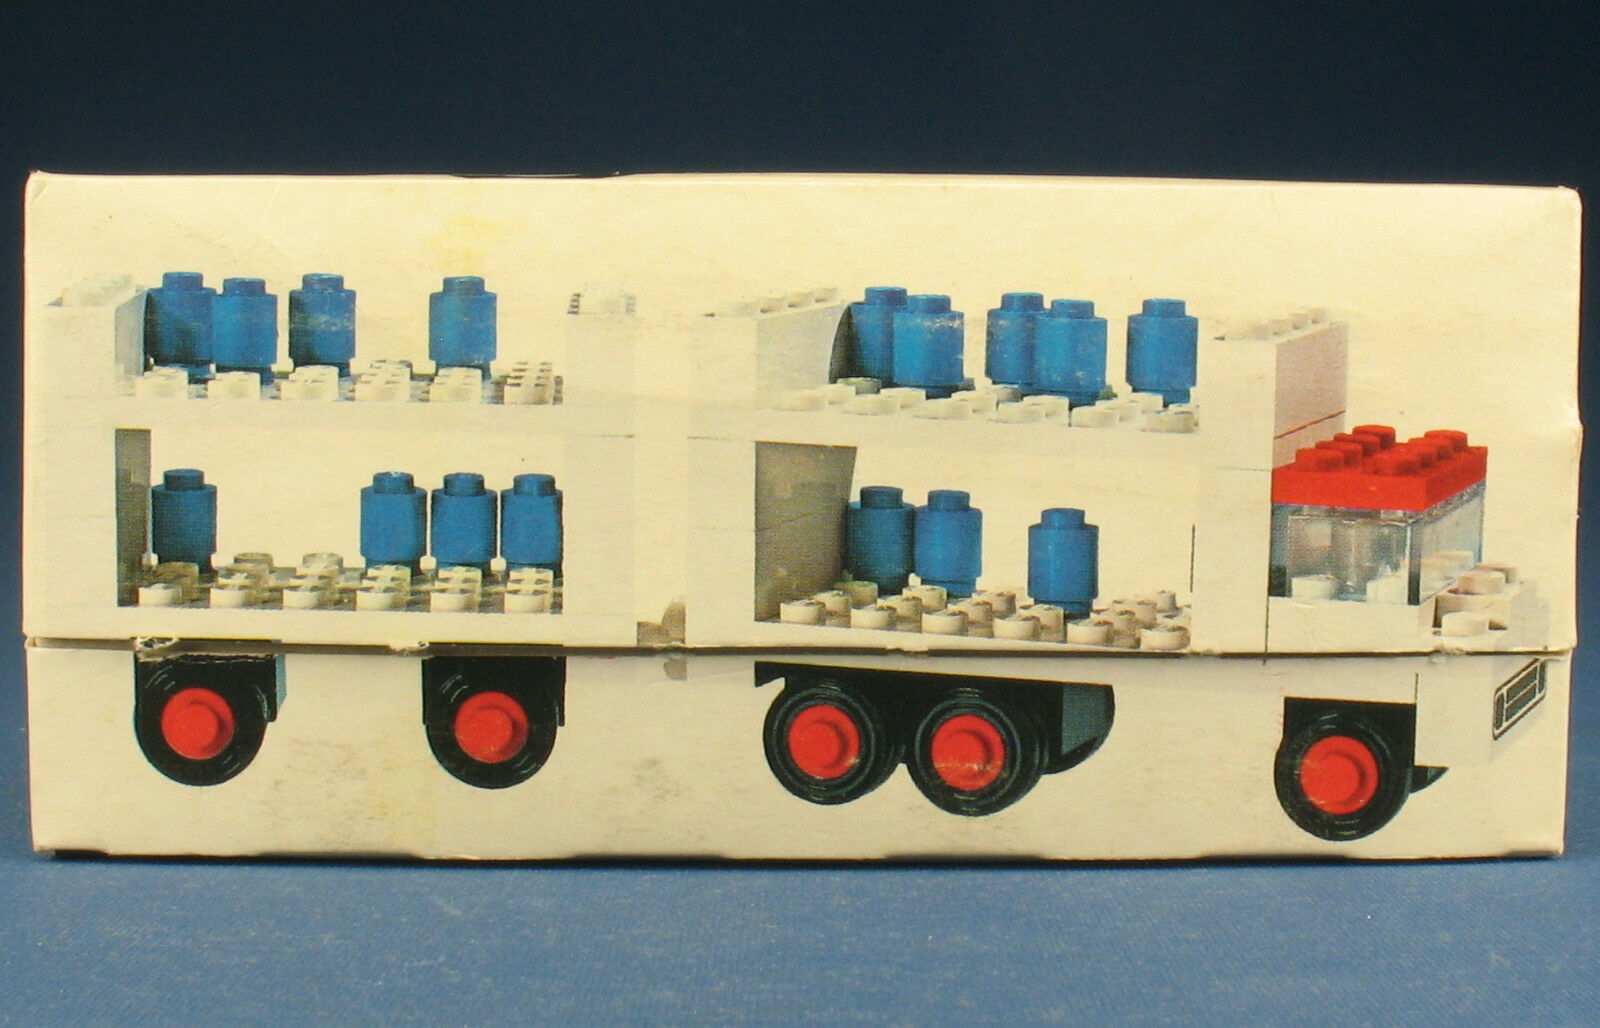 LEGO 645 - Milchwagen LKW - Milk Float & Trailer - in OVP   Legoland Box - 1971